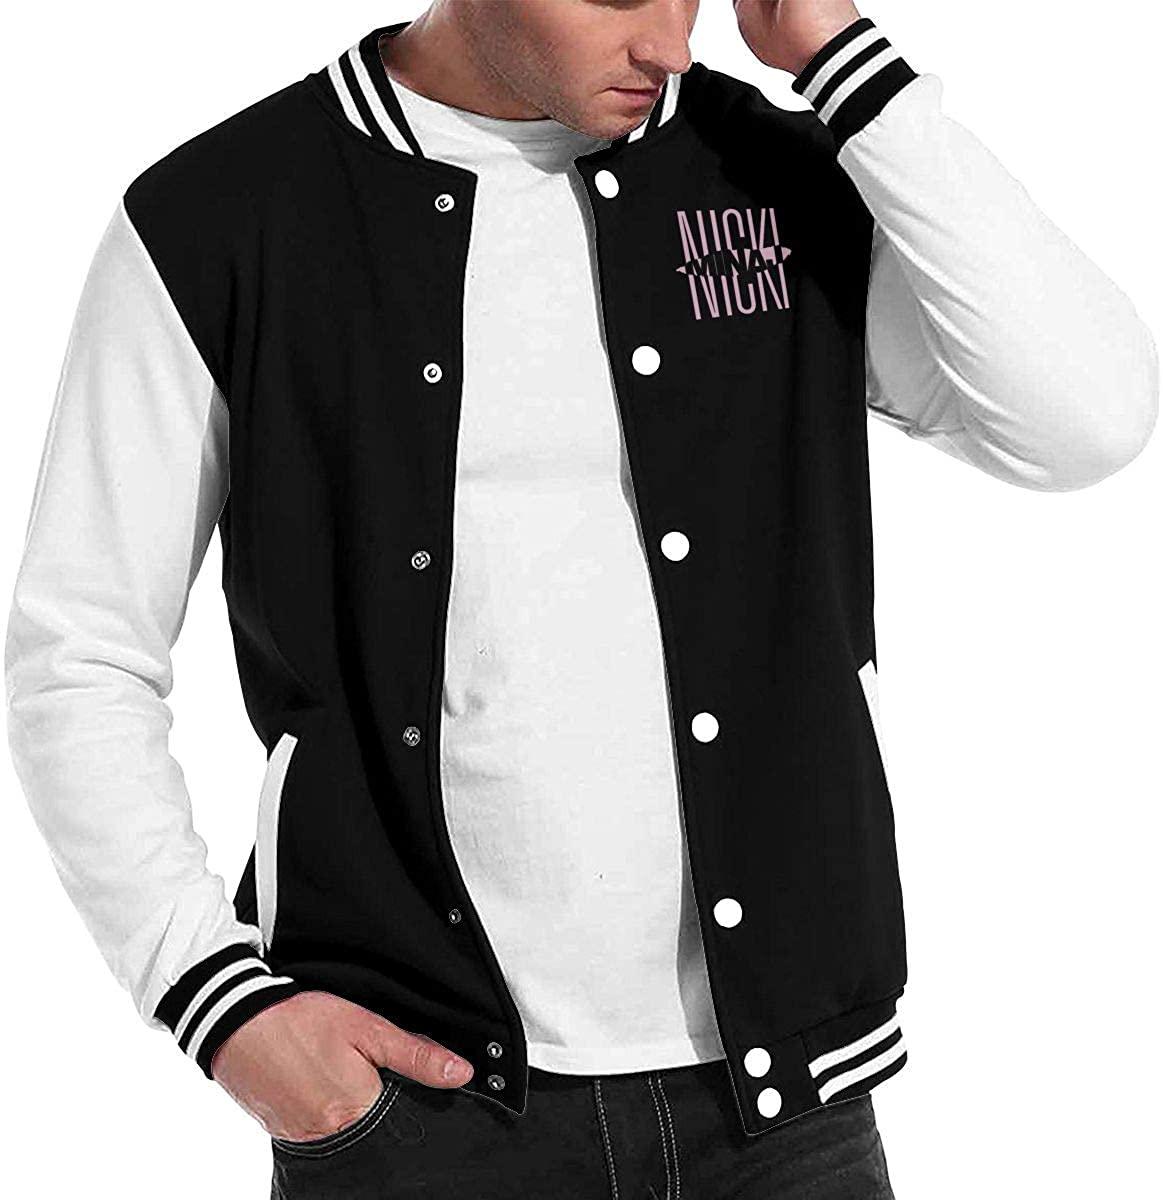 SusanHuling Nicki Minaj Unisex Casual Baseball Jacket Coat Slim Fit Lightweight Jacket Varsity Jacket XL Black